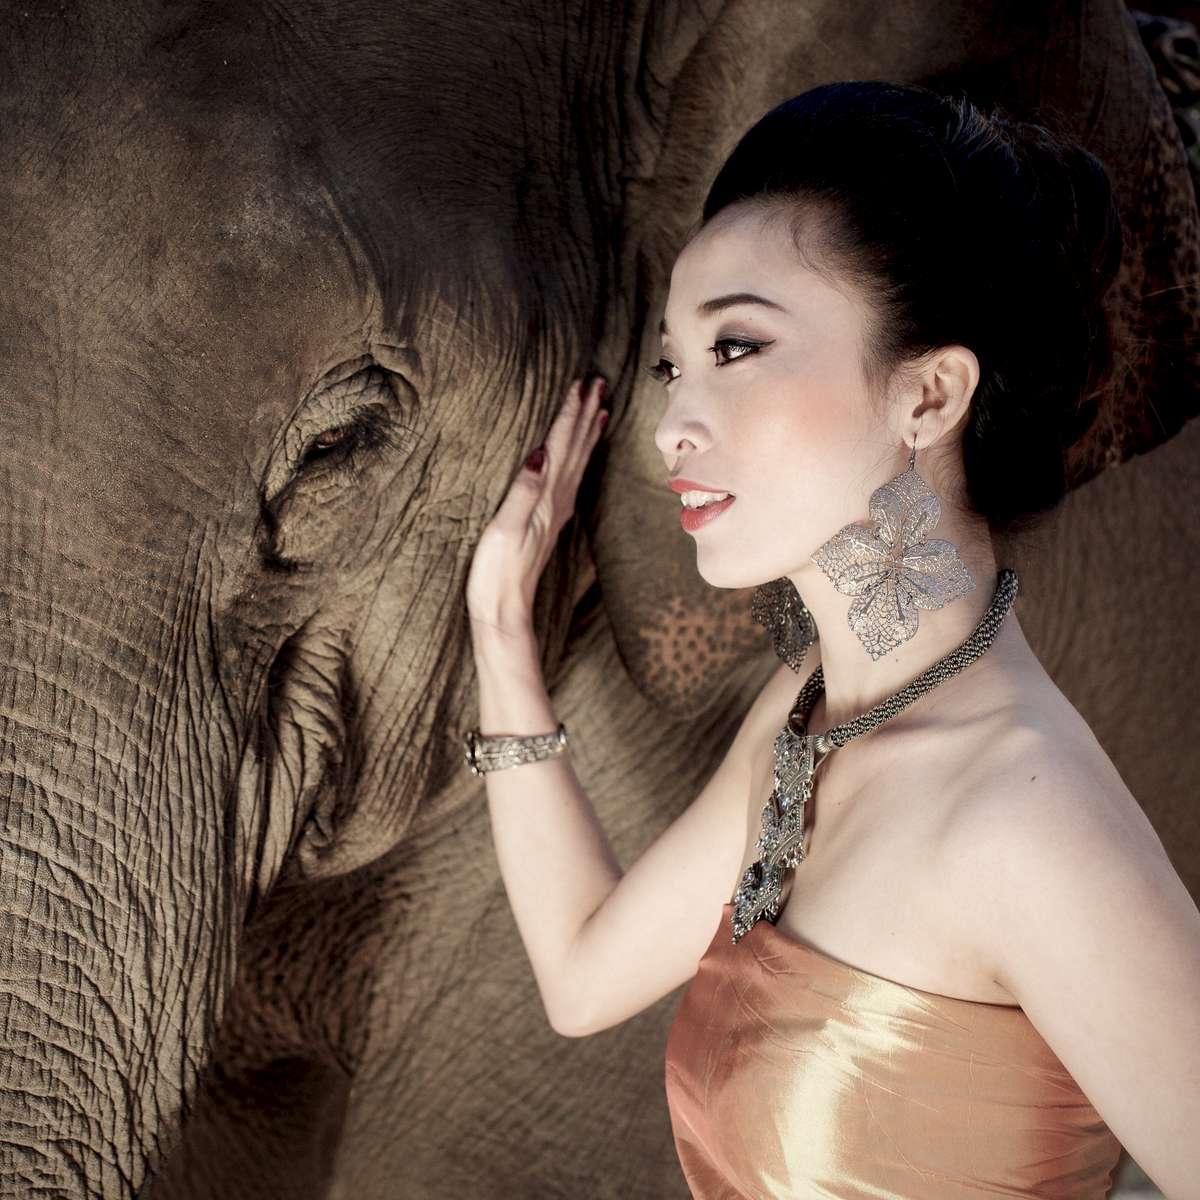 laos-sao-lao-asian-elephant-CEB_4309